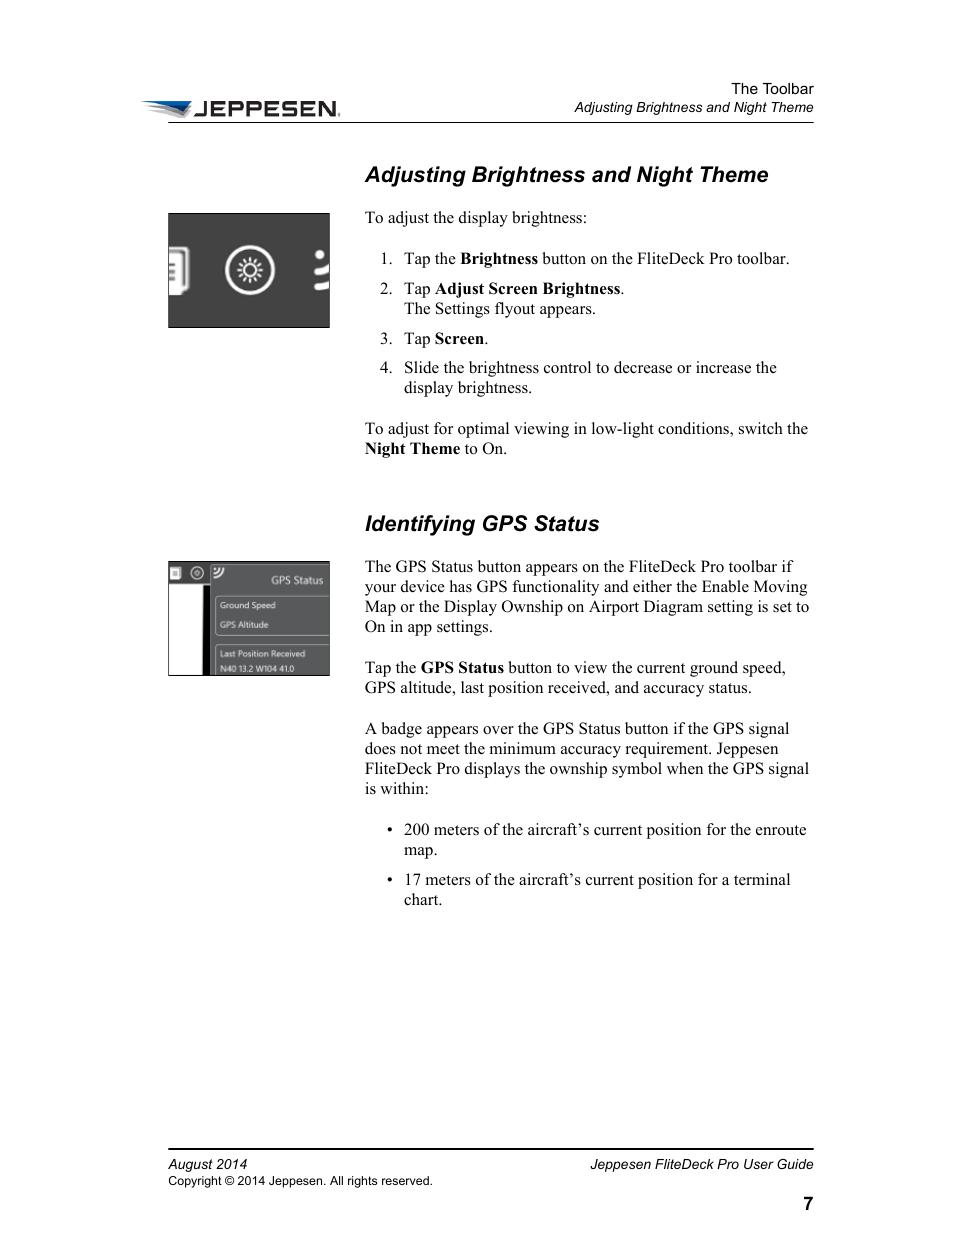 Adjusting Brightness And Night Theme Identifying Gps Status